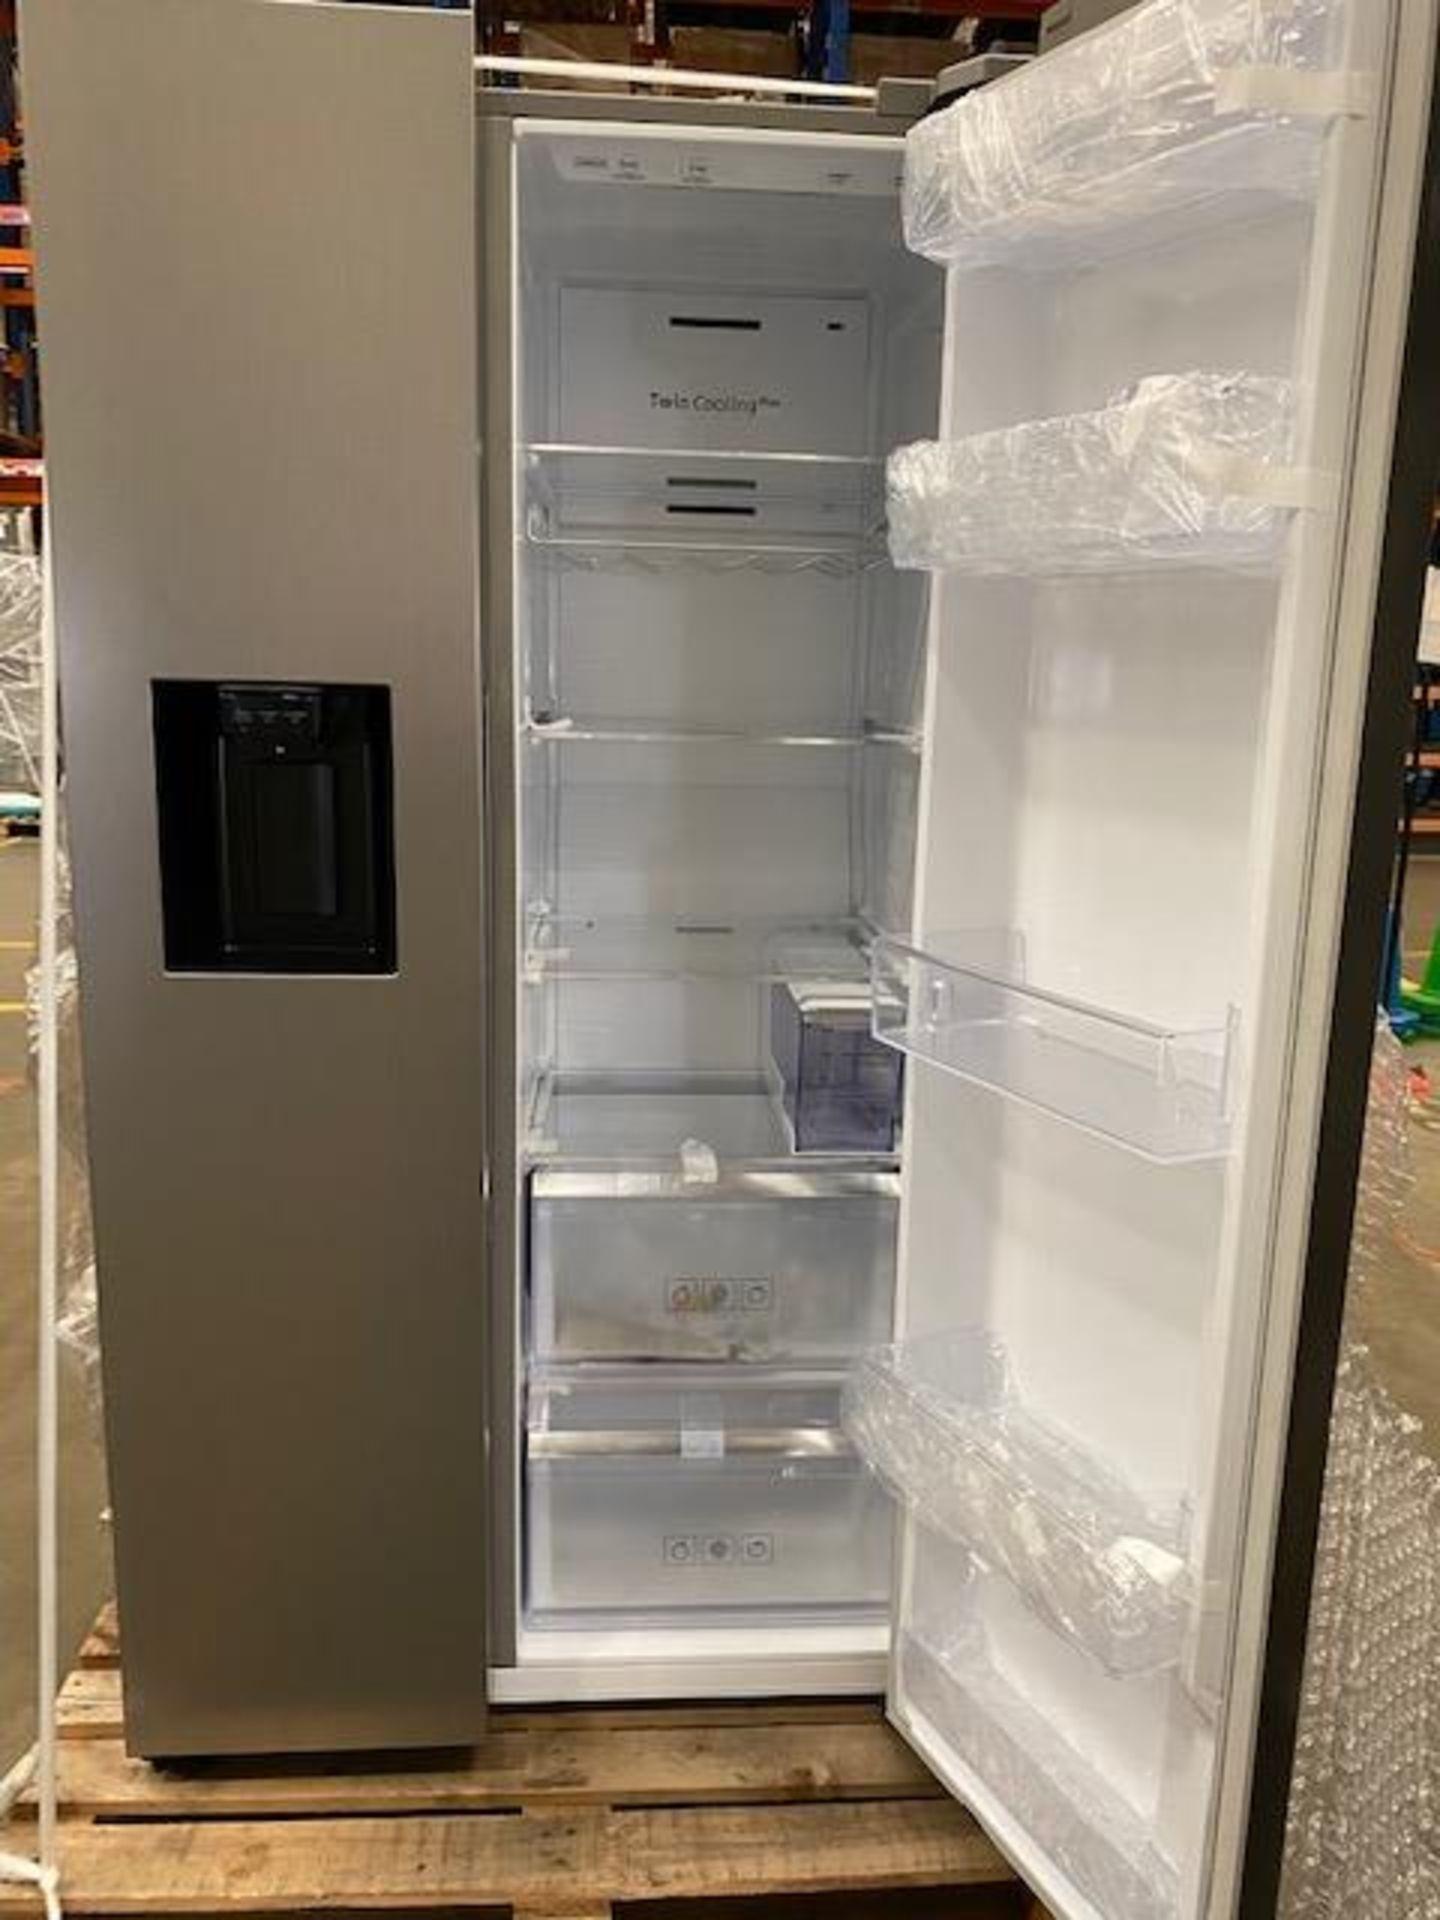 Pallet of 1 Samsung Water & Ice Fridge freezer. Latest selling price £1,329.99* - Image 5 of 9